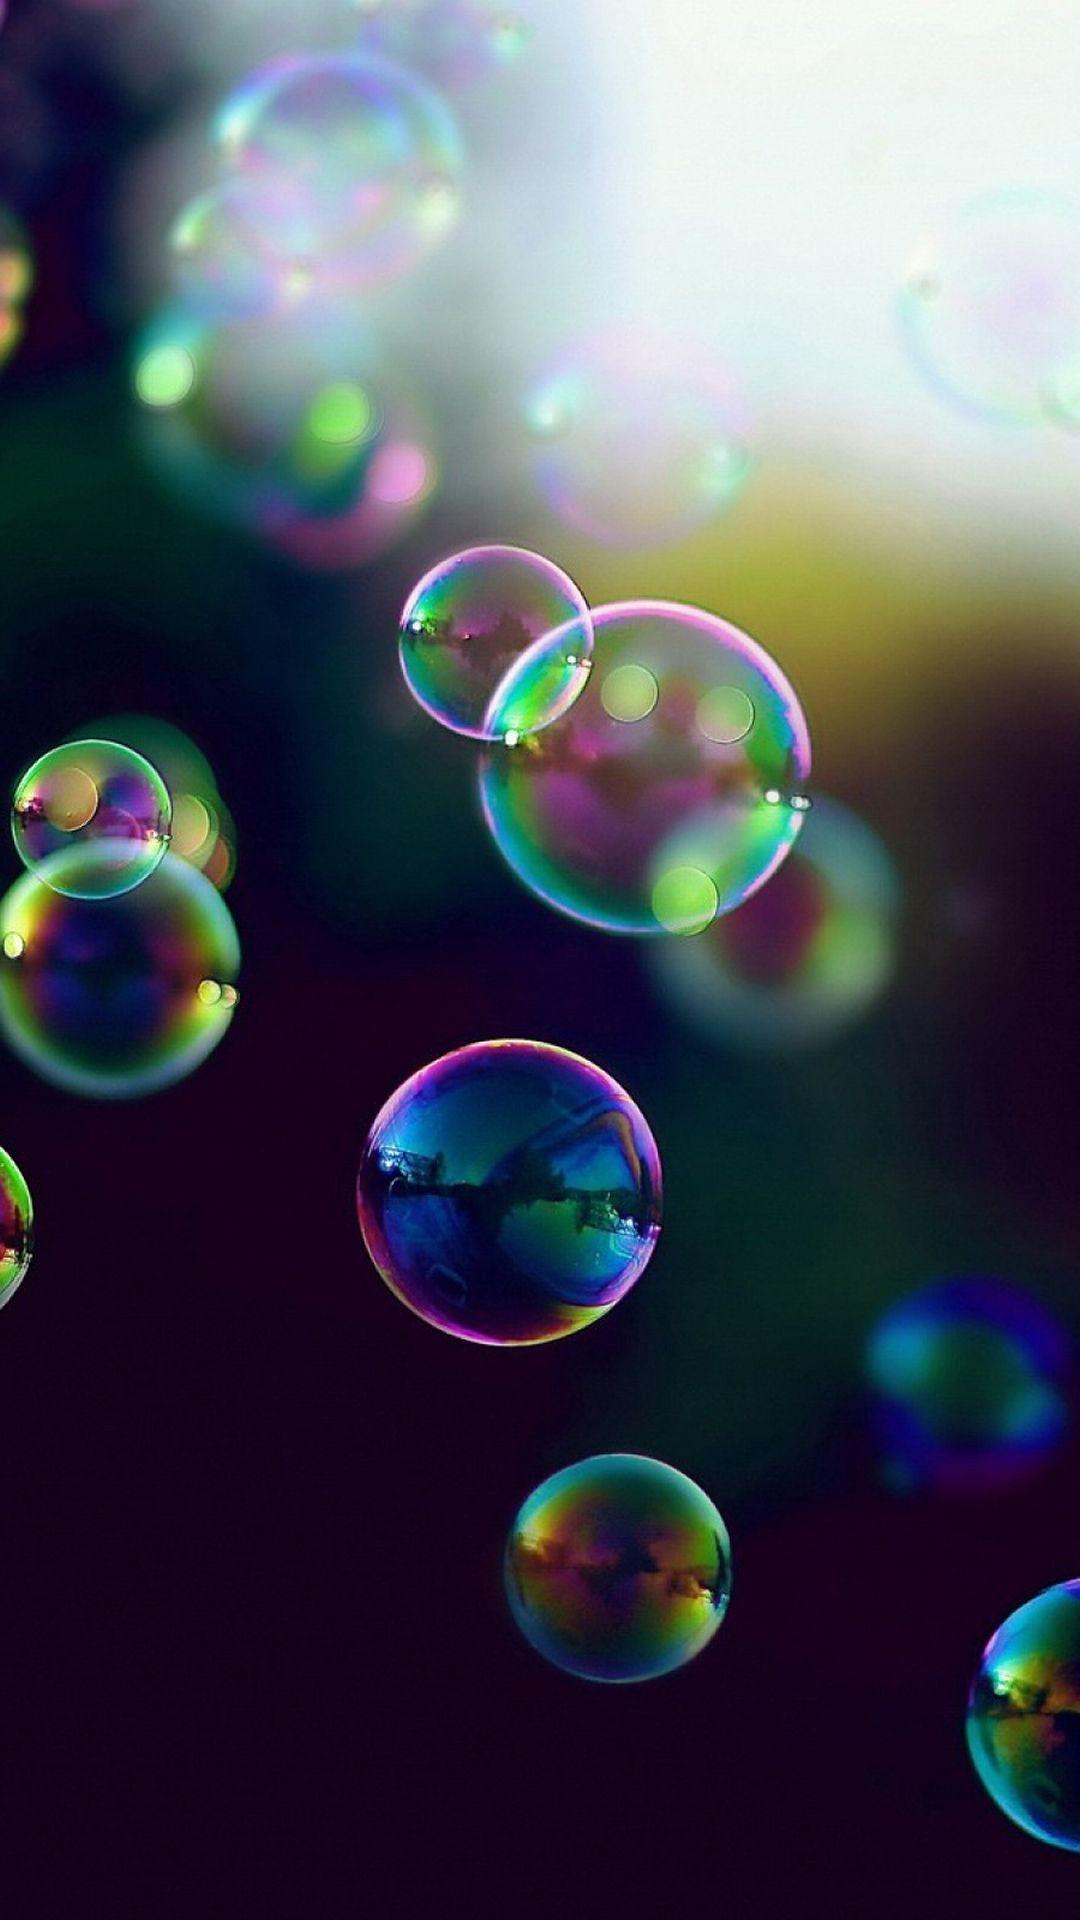 iridescence | bubbles iridescence wallpaper - 1080x1920